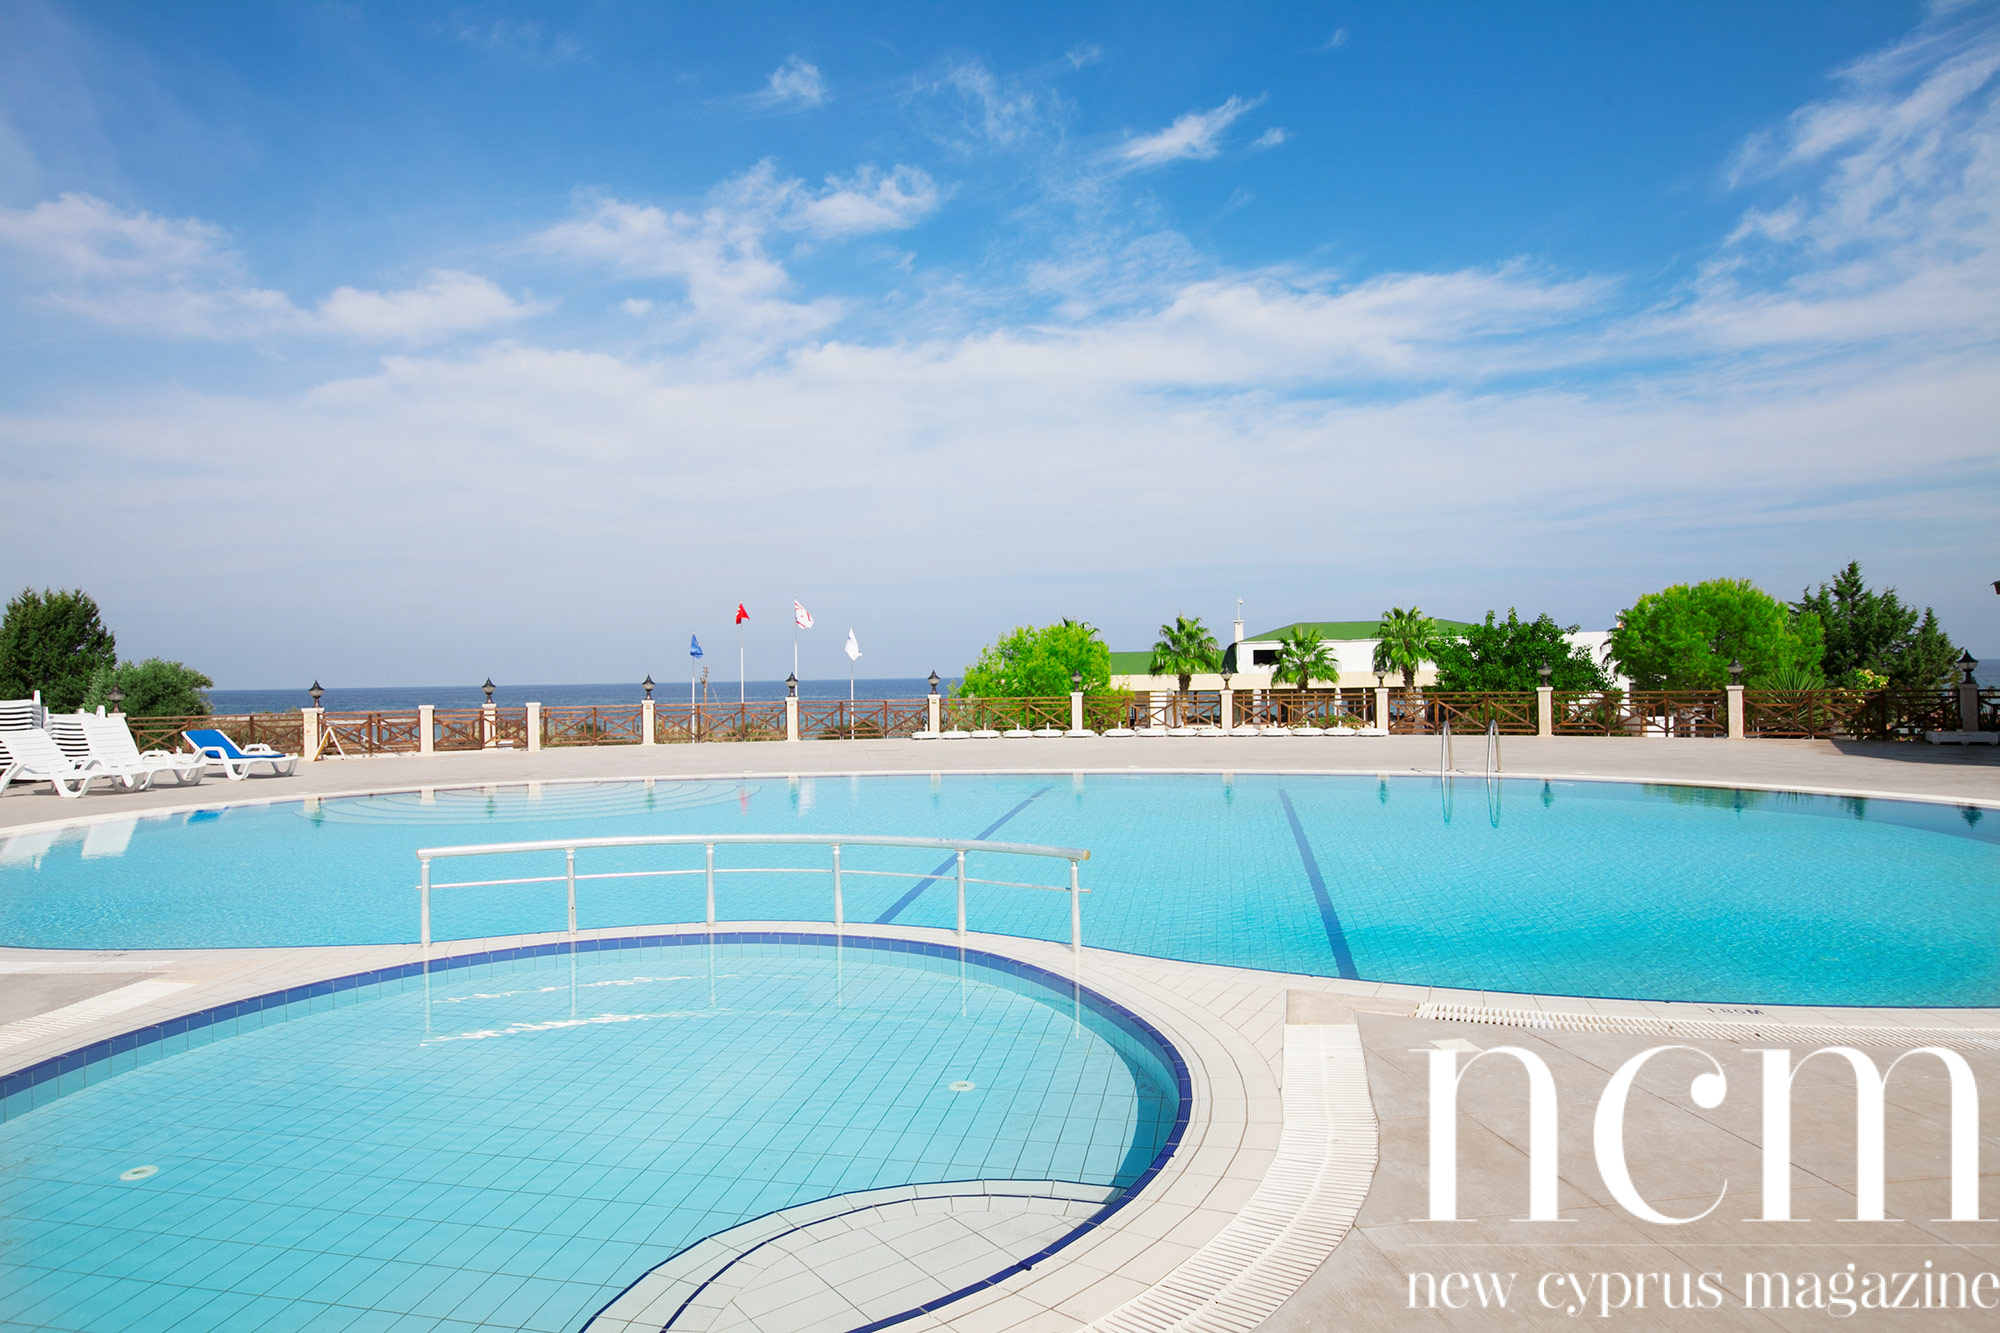 Kaplica hotel north cyprus